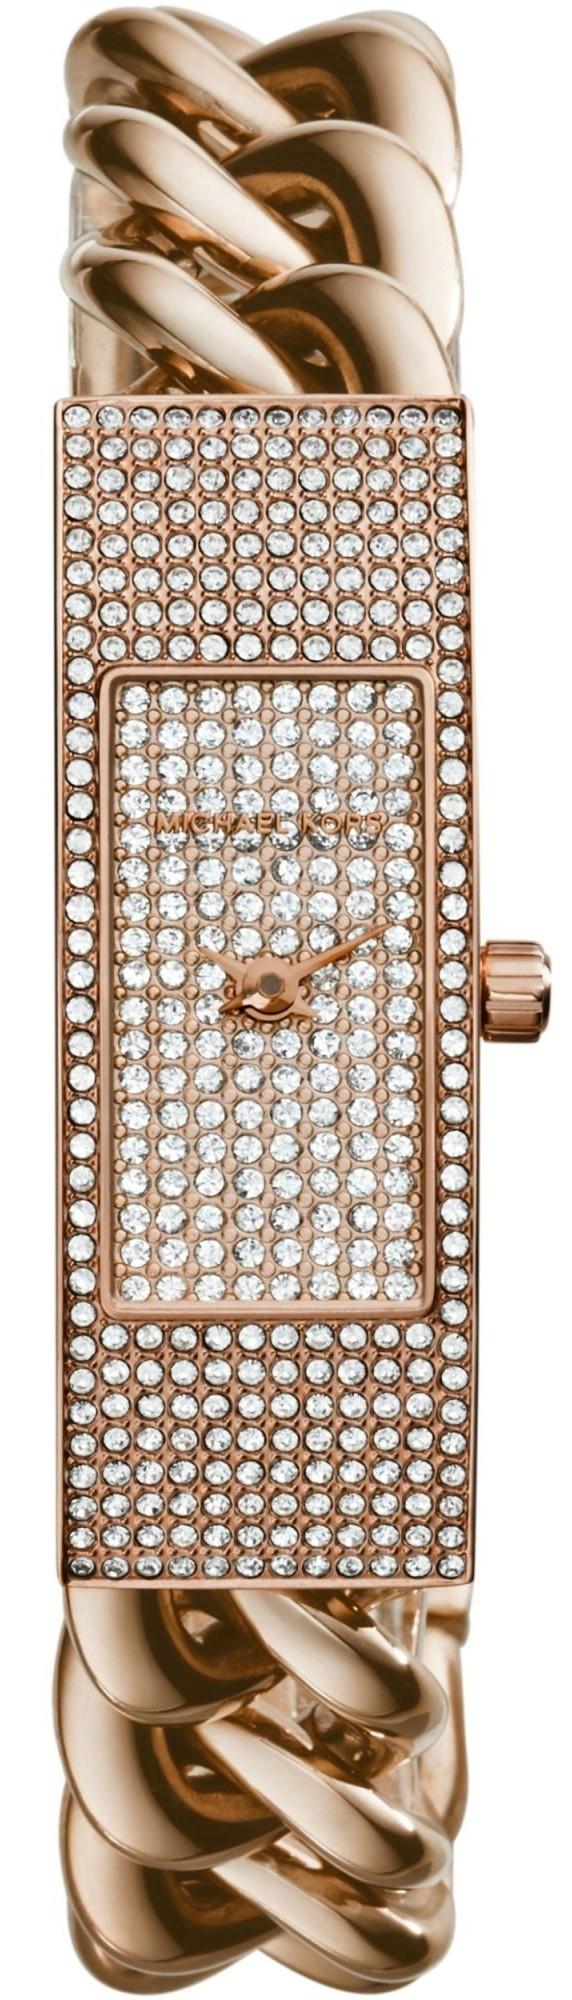 Michael Kors Women's Hayden Crystal Pave Dial Rose Gold Tone Watch MK3307